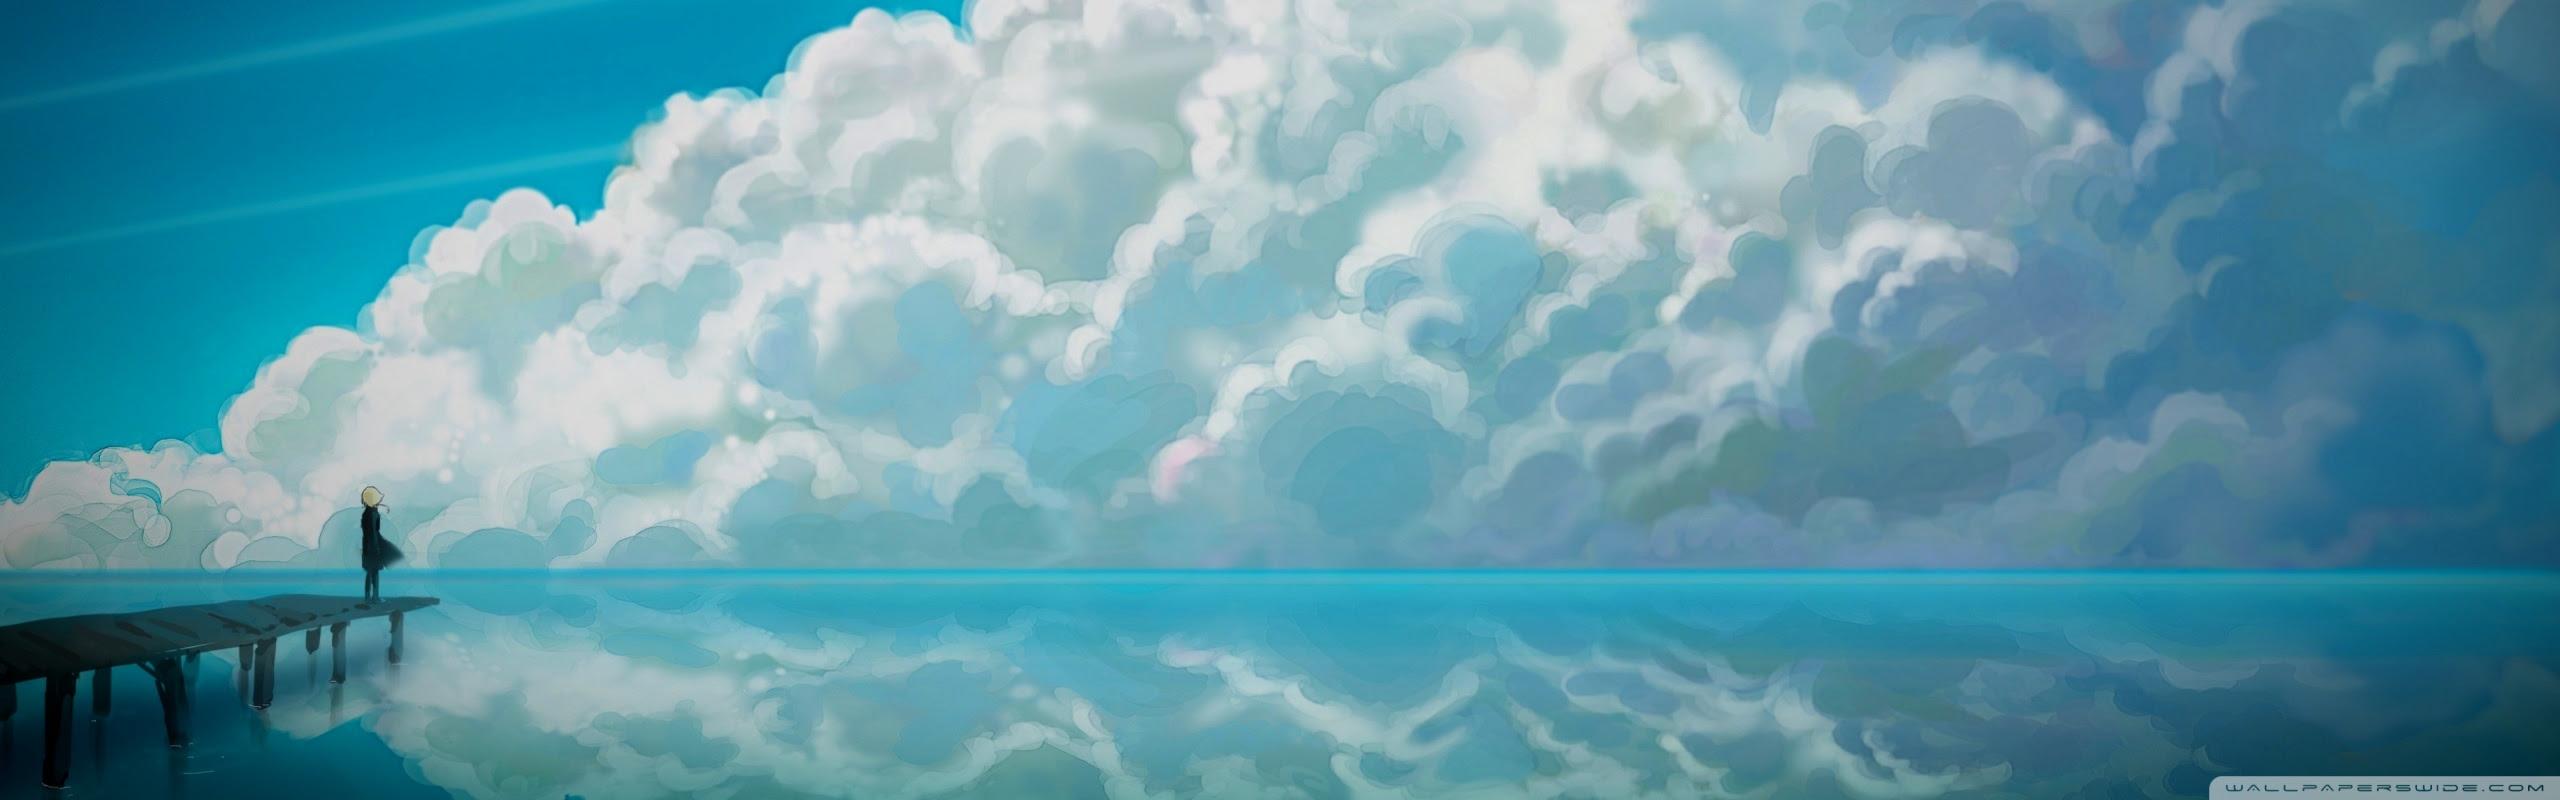 Sky Anime Ultra Hd Desktop Background Wallpaper For Widescreen